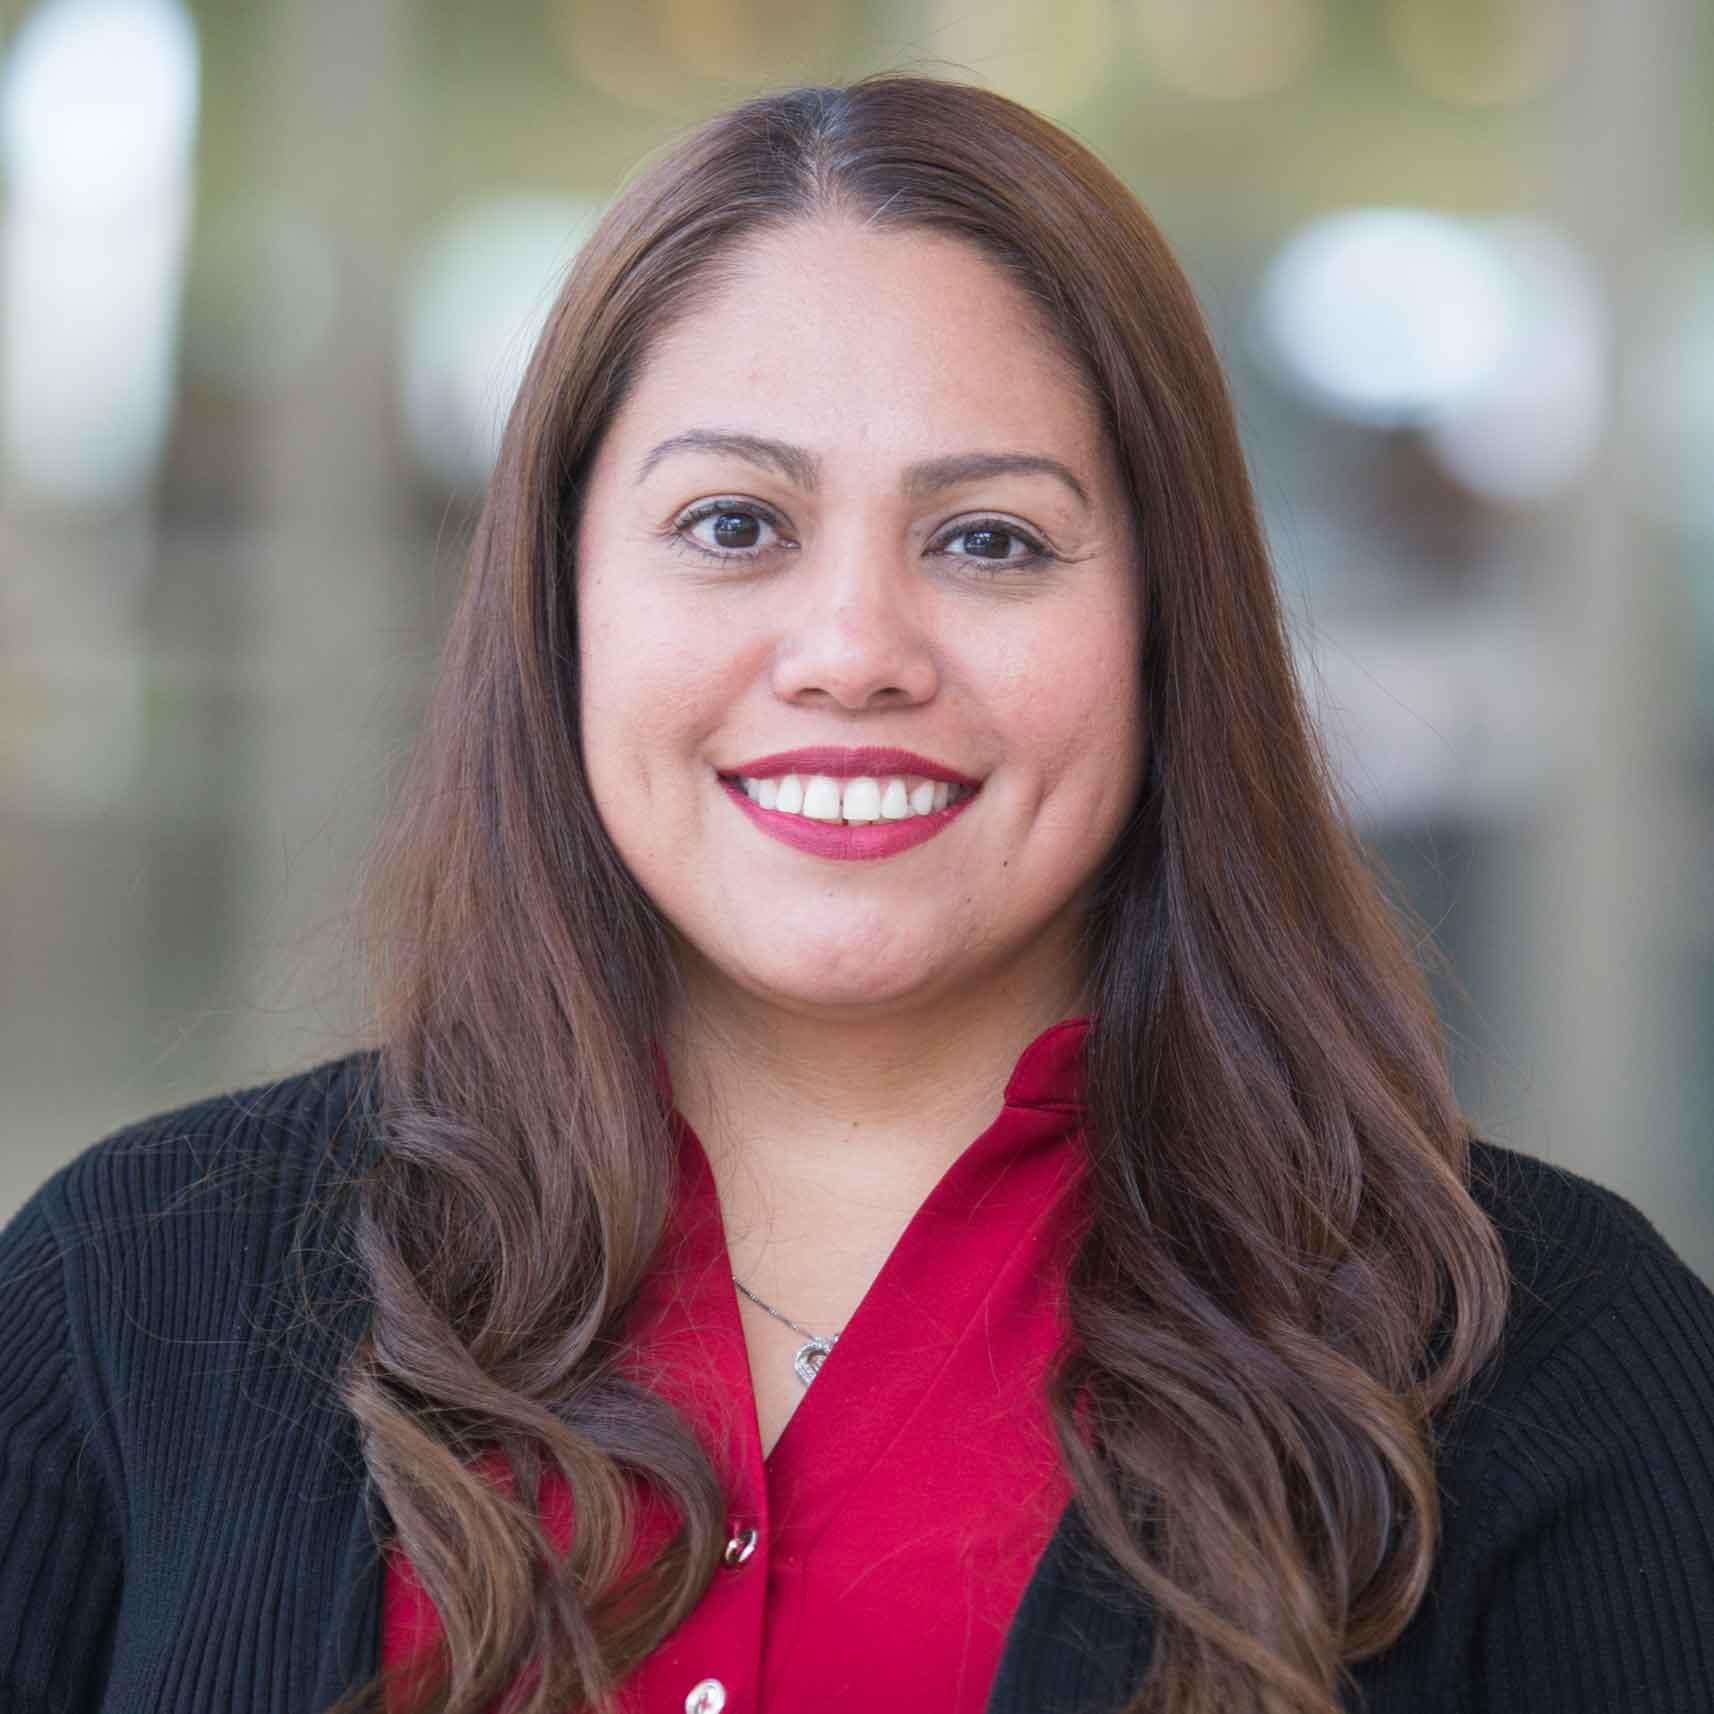 Brenda Cortez